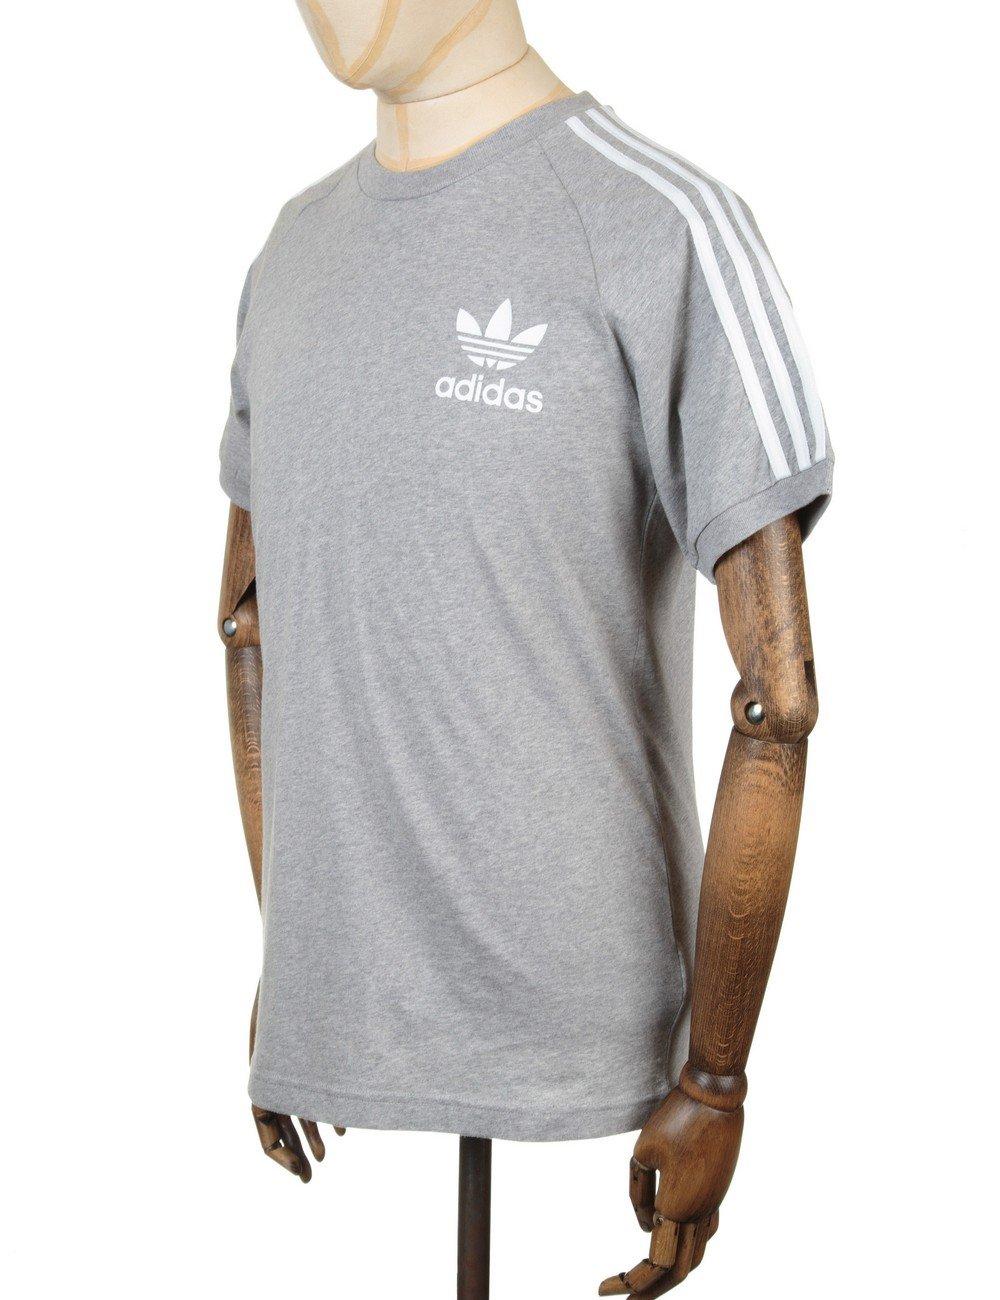 Adidas Originals Retro Trefoil Logo T Shirt Medium Grey